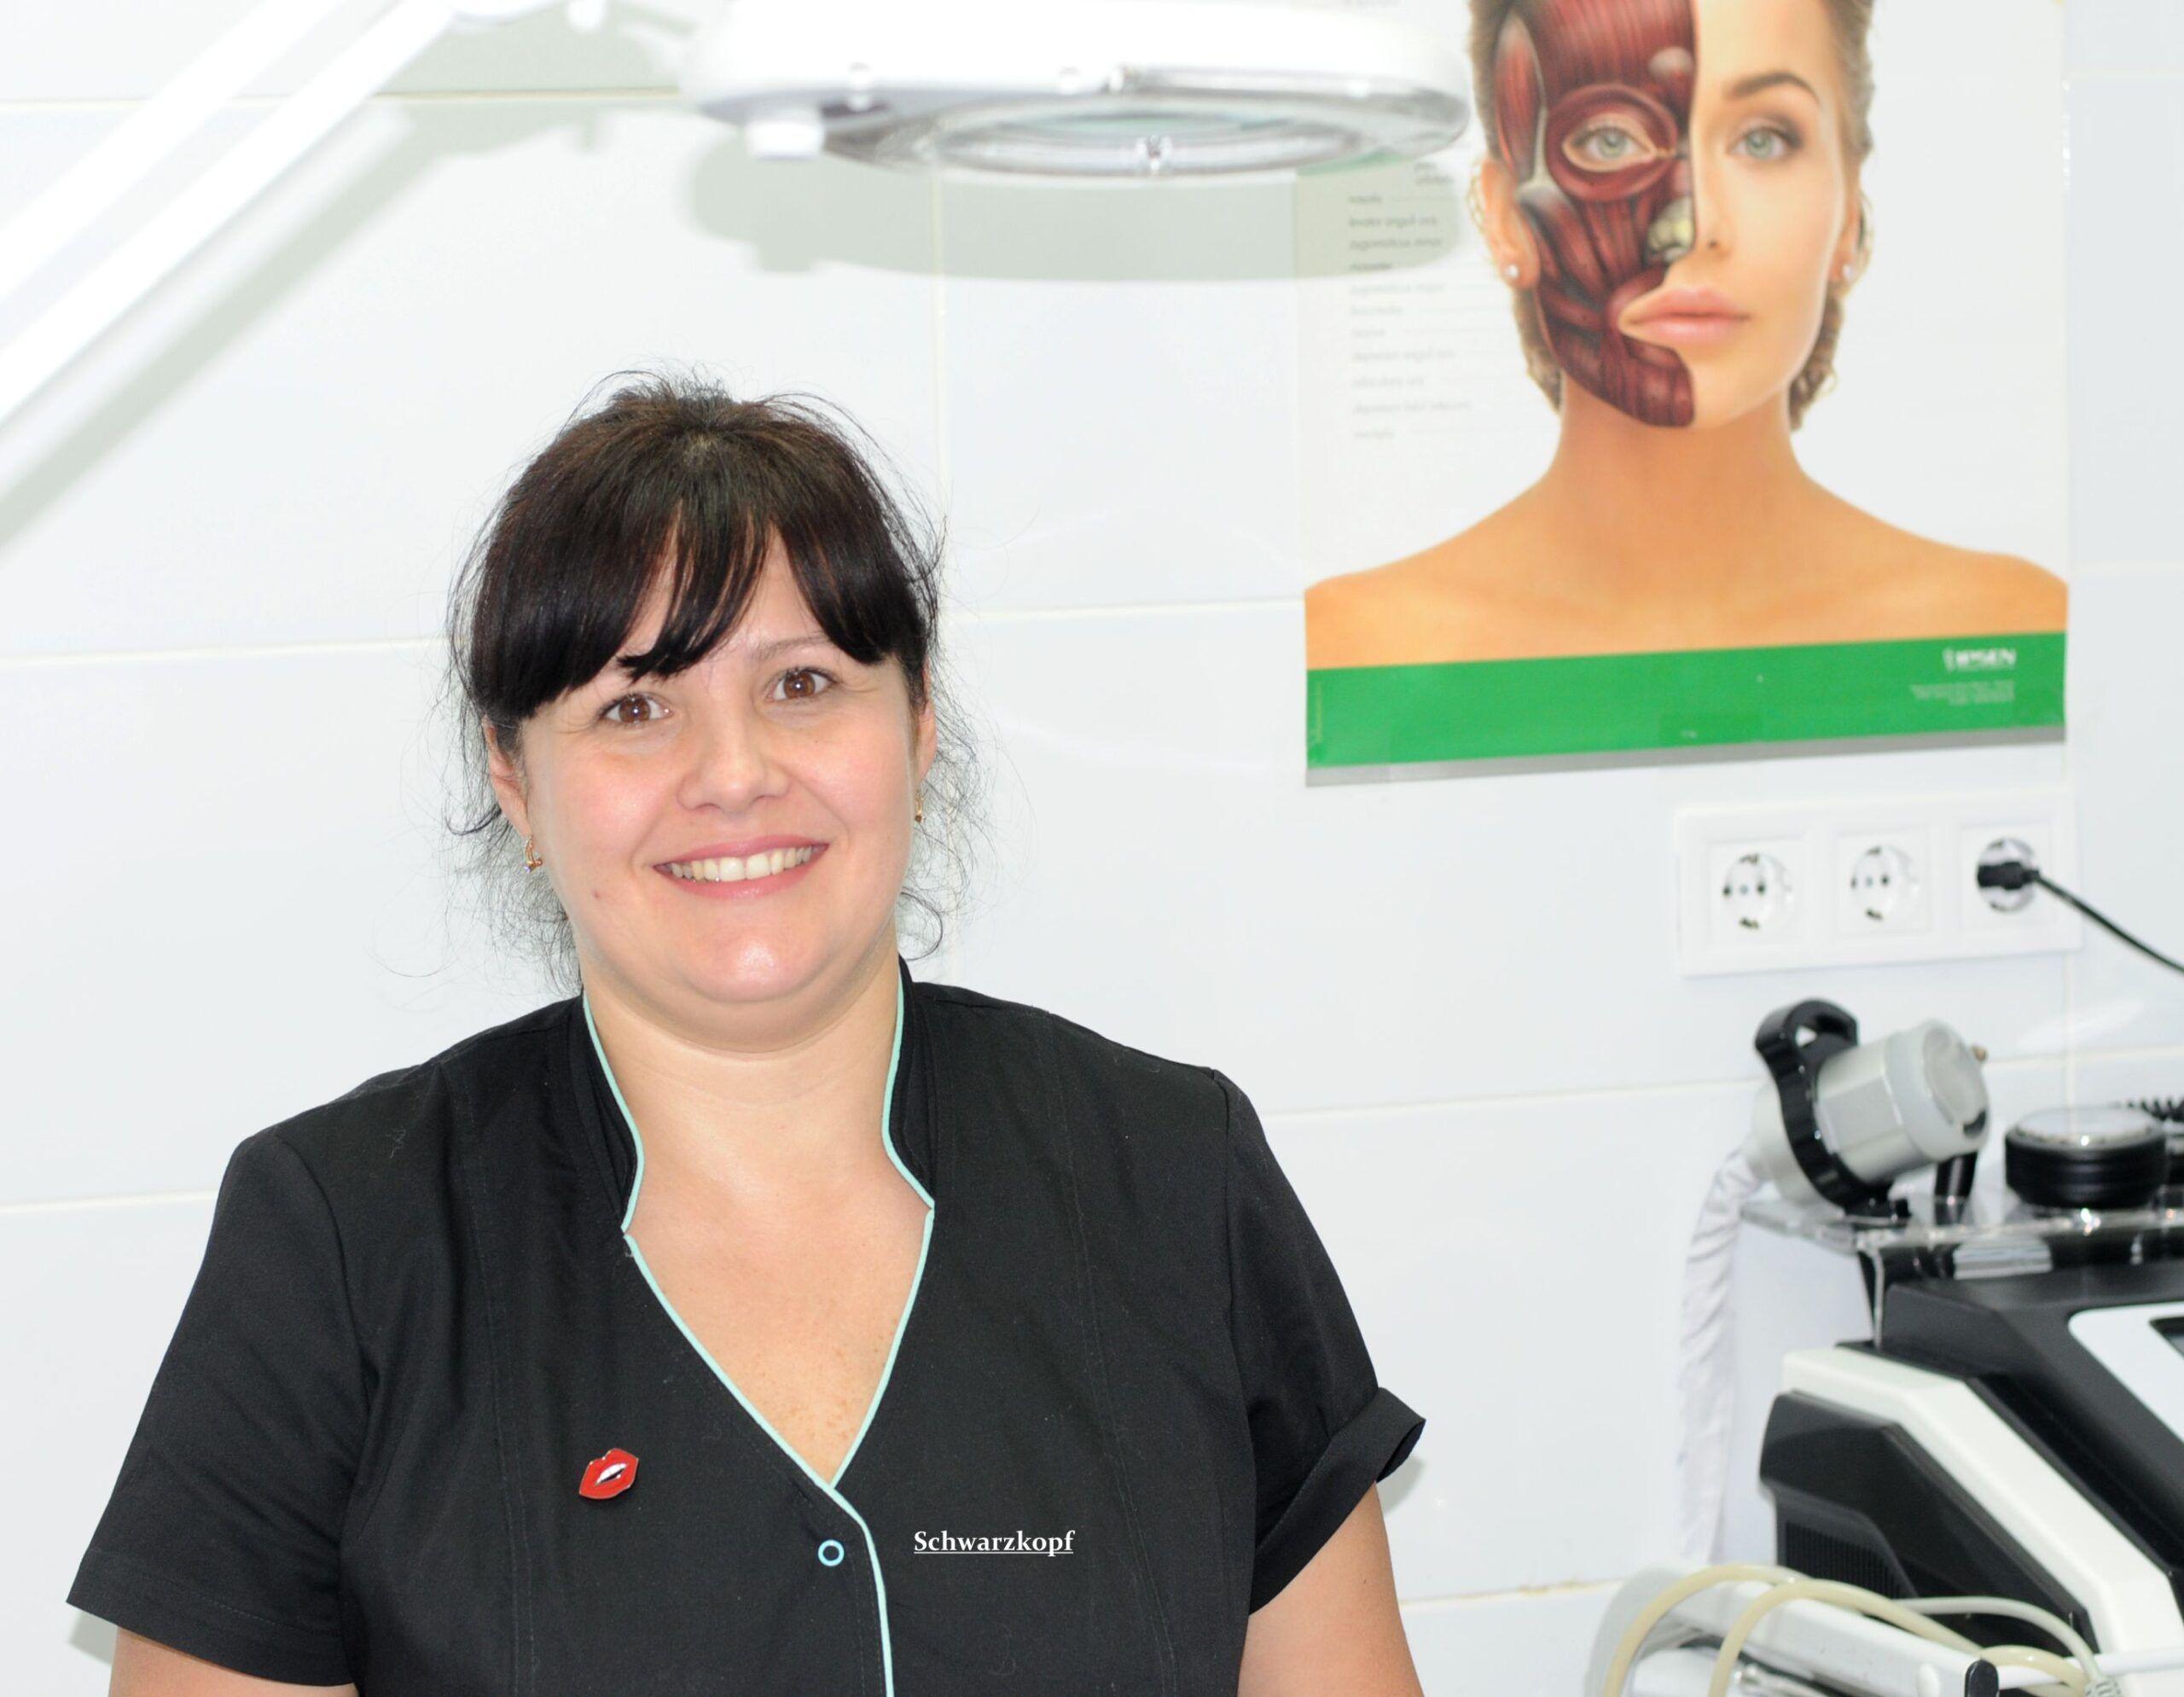 Косова Елена Владимировна -Врач косметолог